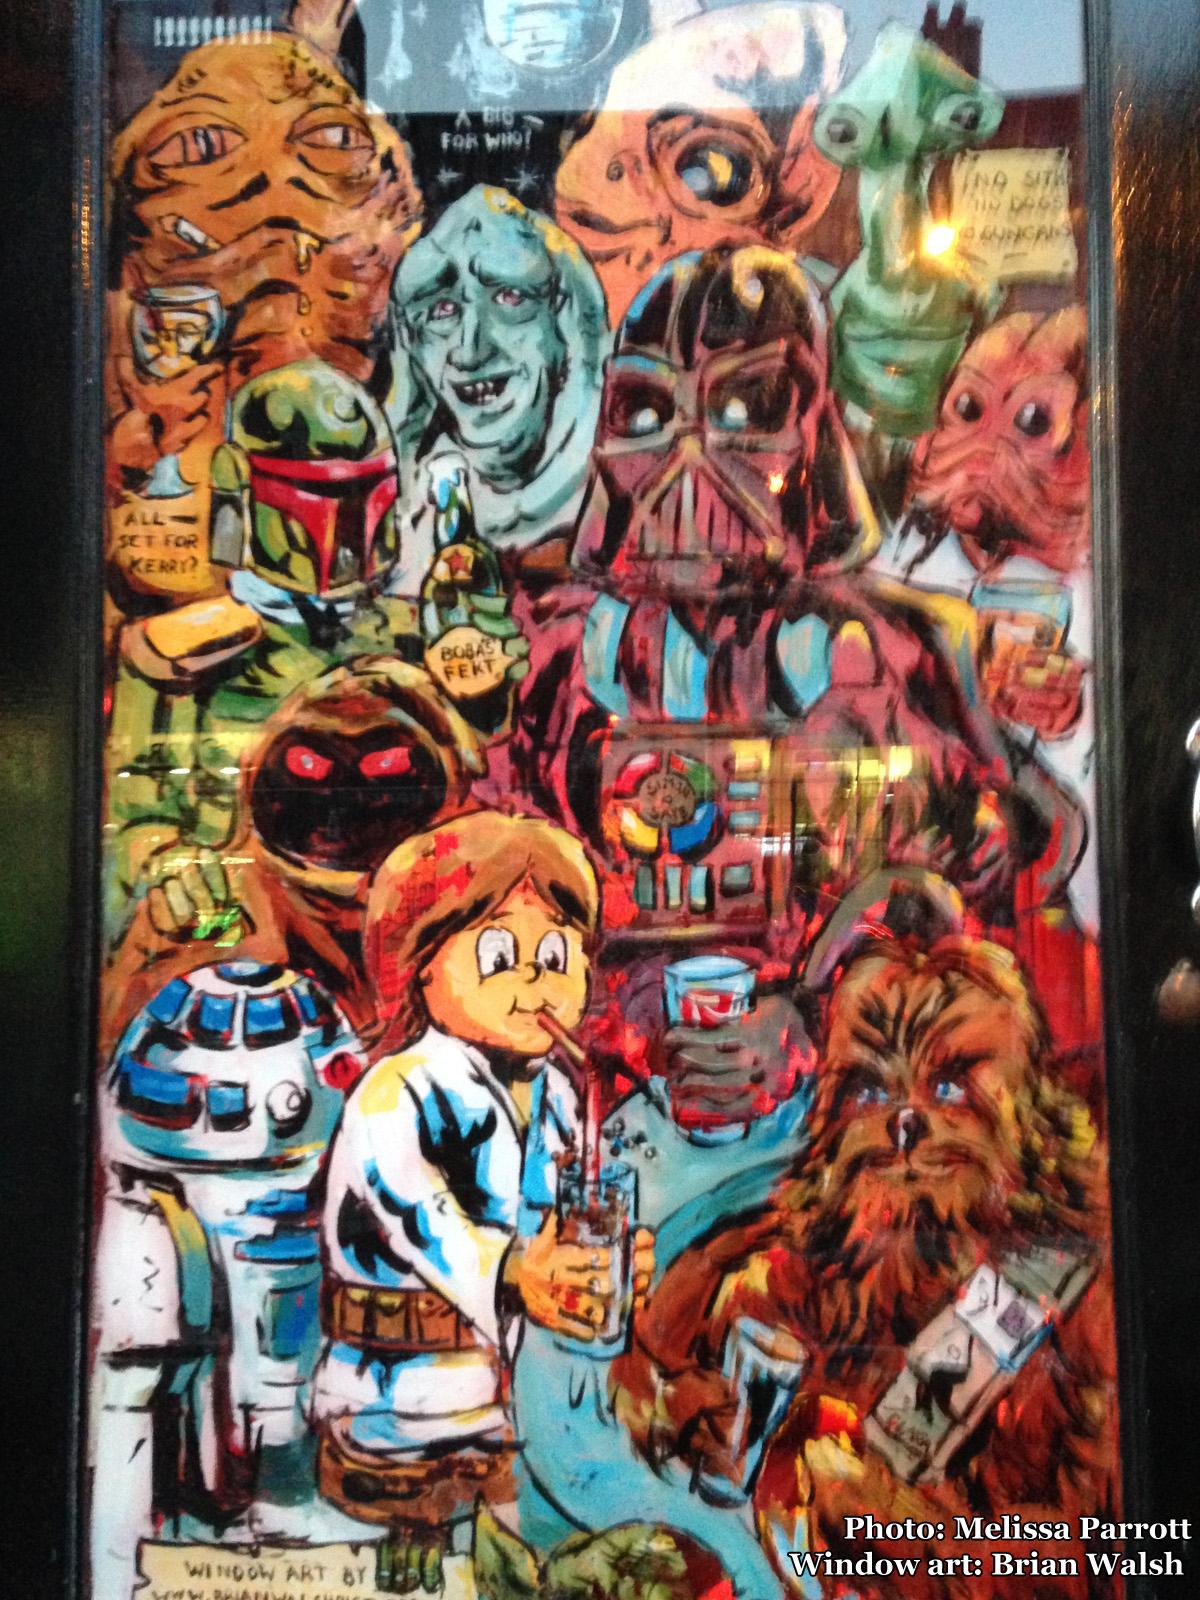 Star Wars window art at Cassidy's